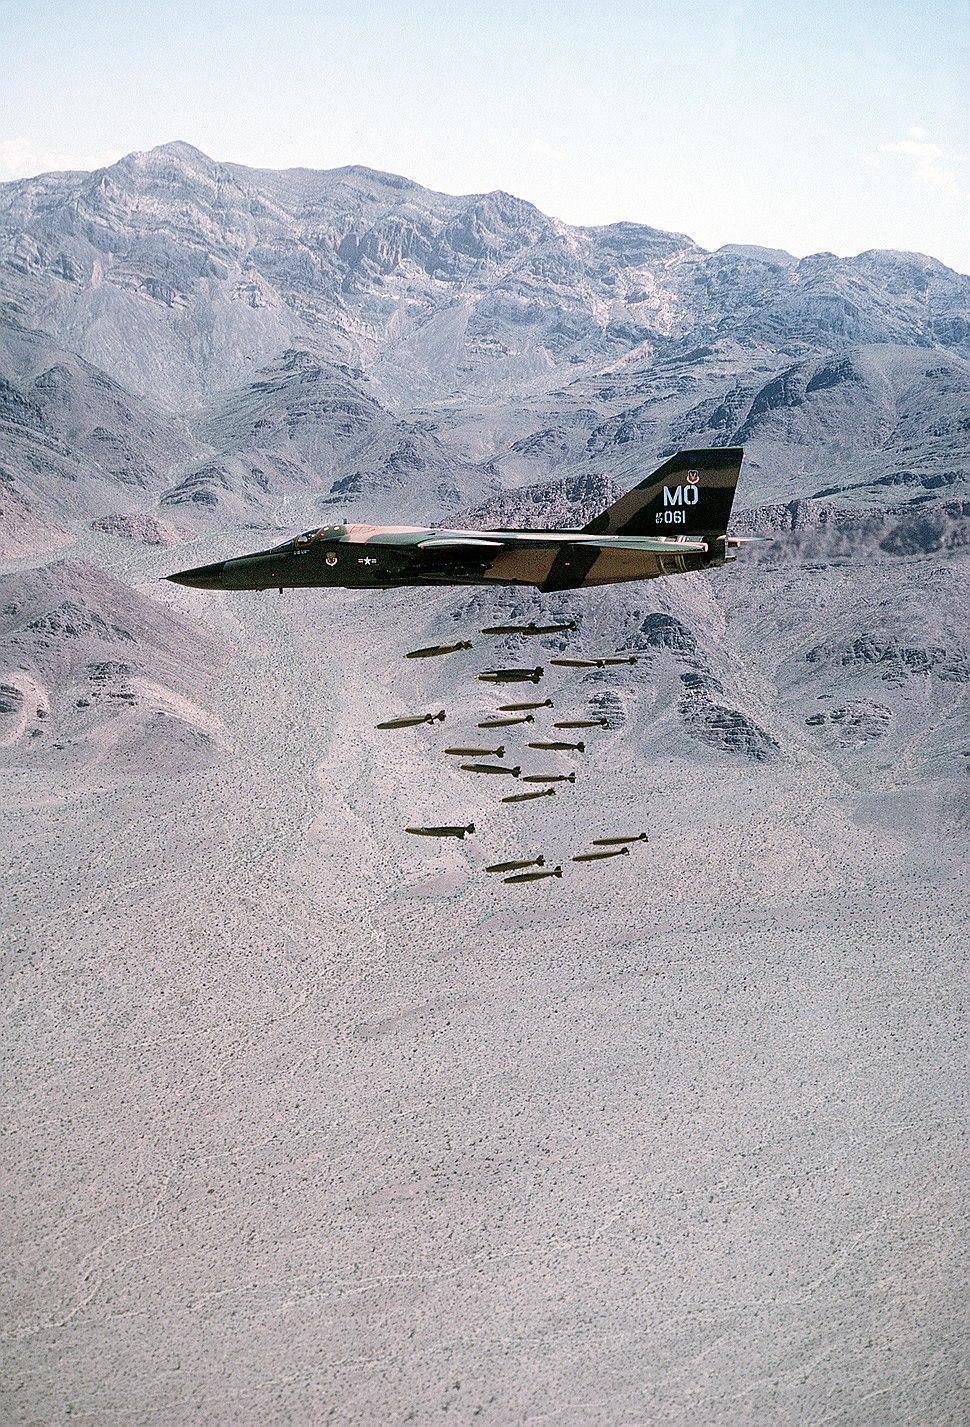 F-111A dropping MK82